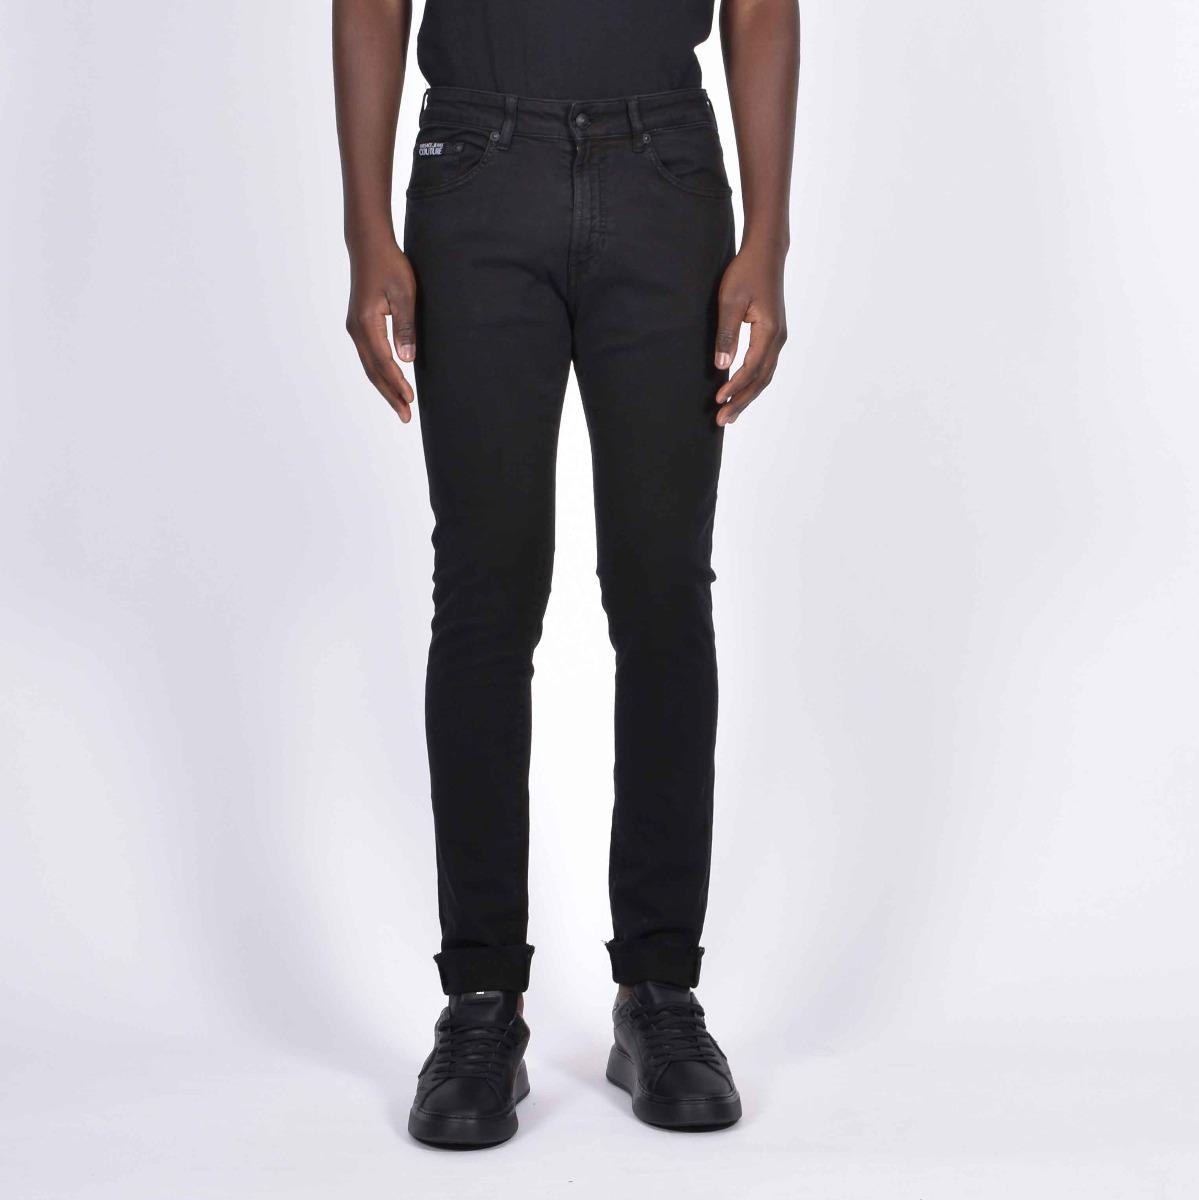 Jeans etichetta logo- Nero